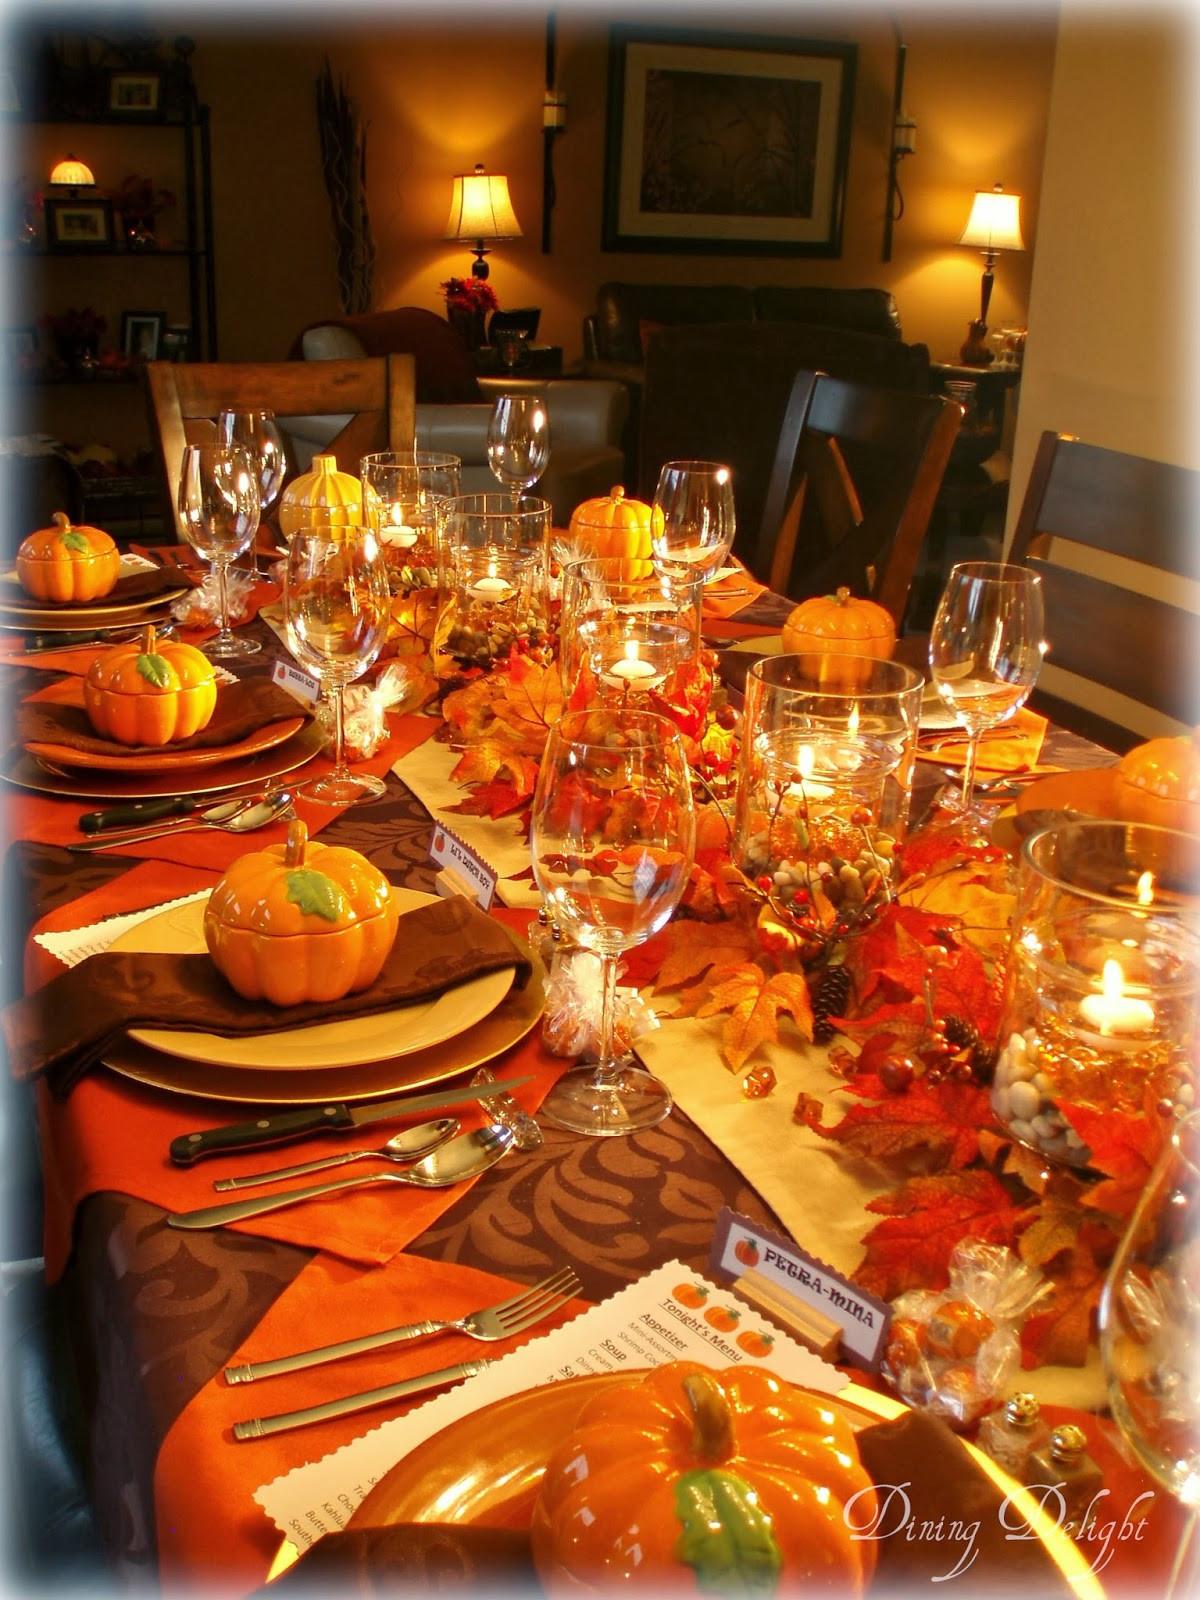 Fall Dinner Ideas  Dining Delight Fall Dinner Party for Ten